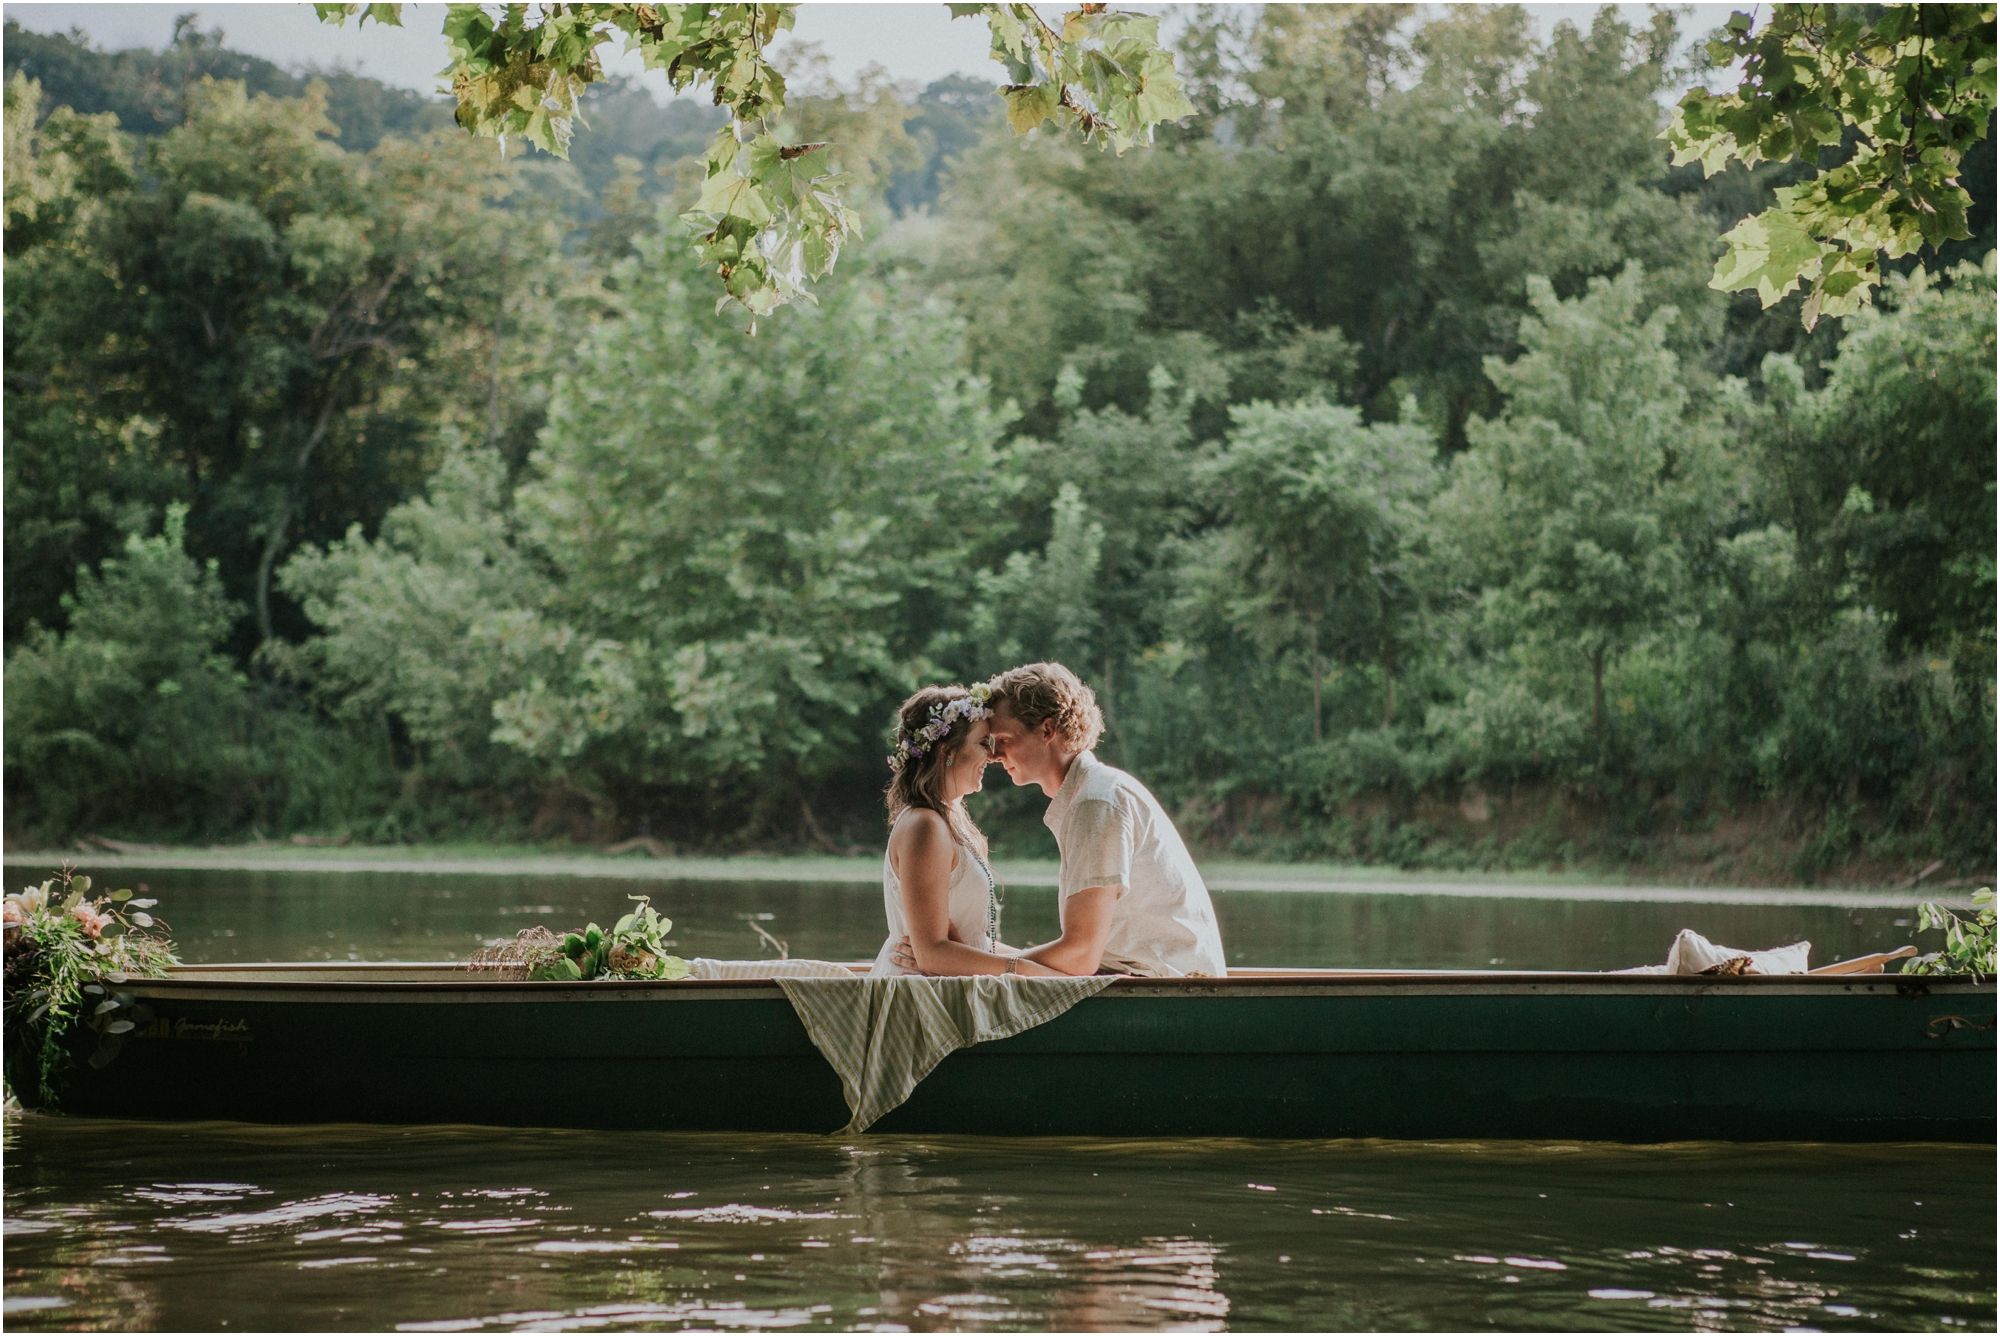 homestead-on-the-holston-hiltons-virginia-bohemian-canoe-styled-shoot-northeast-tennessee-elopement-wild-free-spirit_0012.jpg